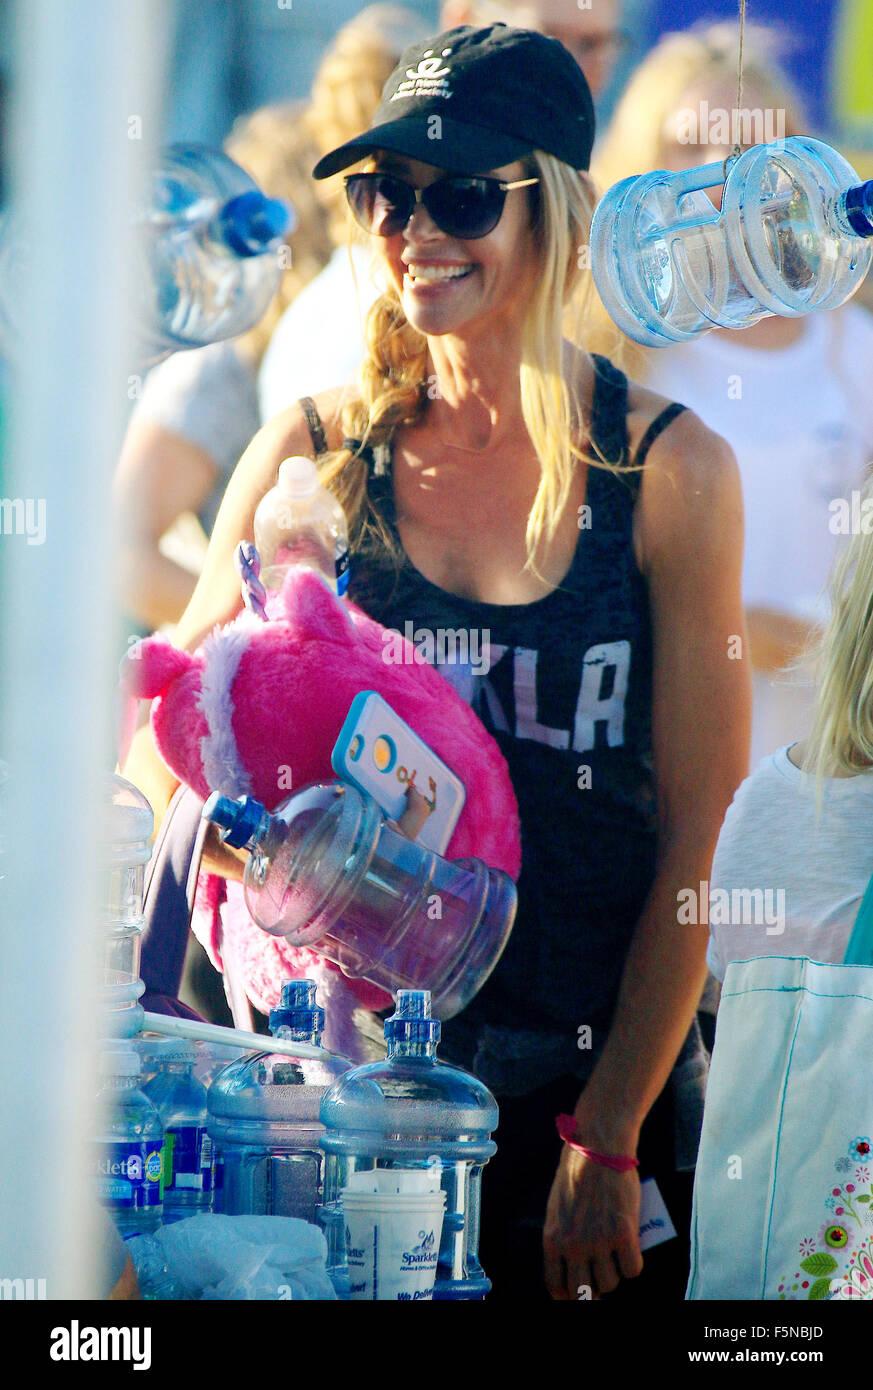 Celebrities attend Malibu Kiwanis Chili Cook-off  Featuring: Denise Richards Where: Malibu, California, United States - Stock Image